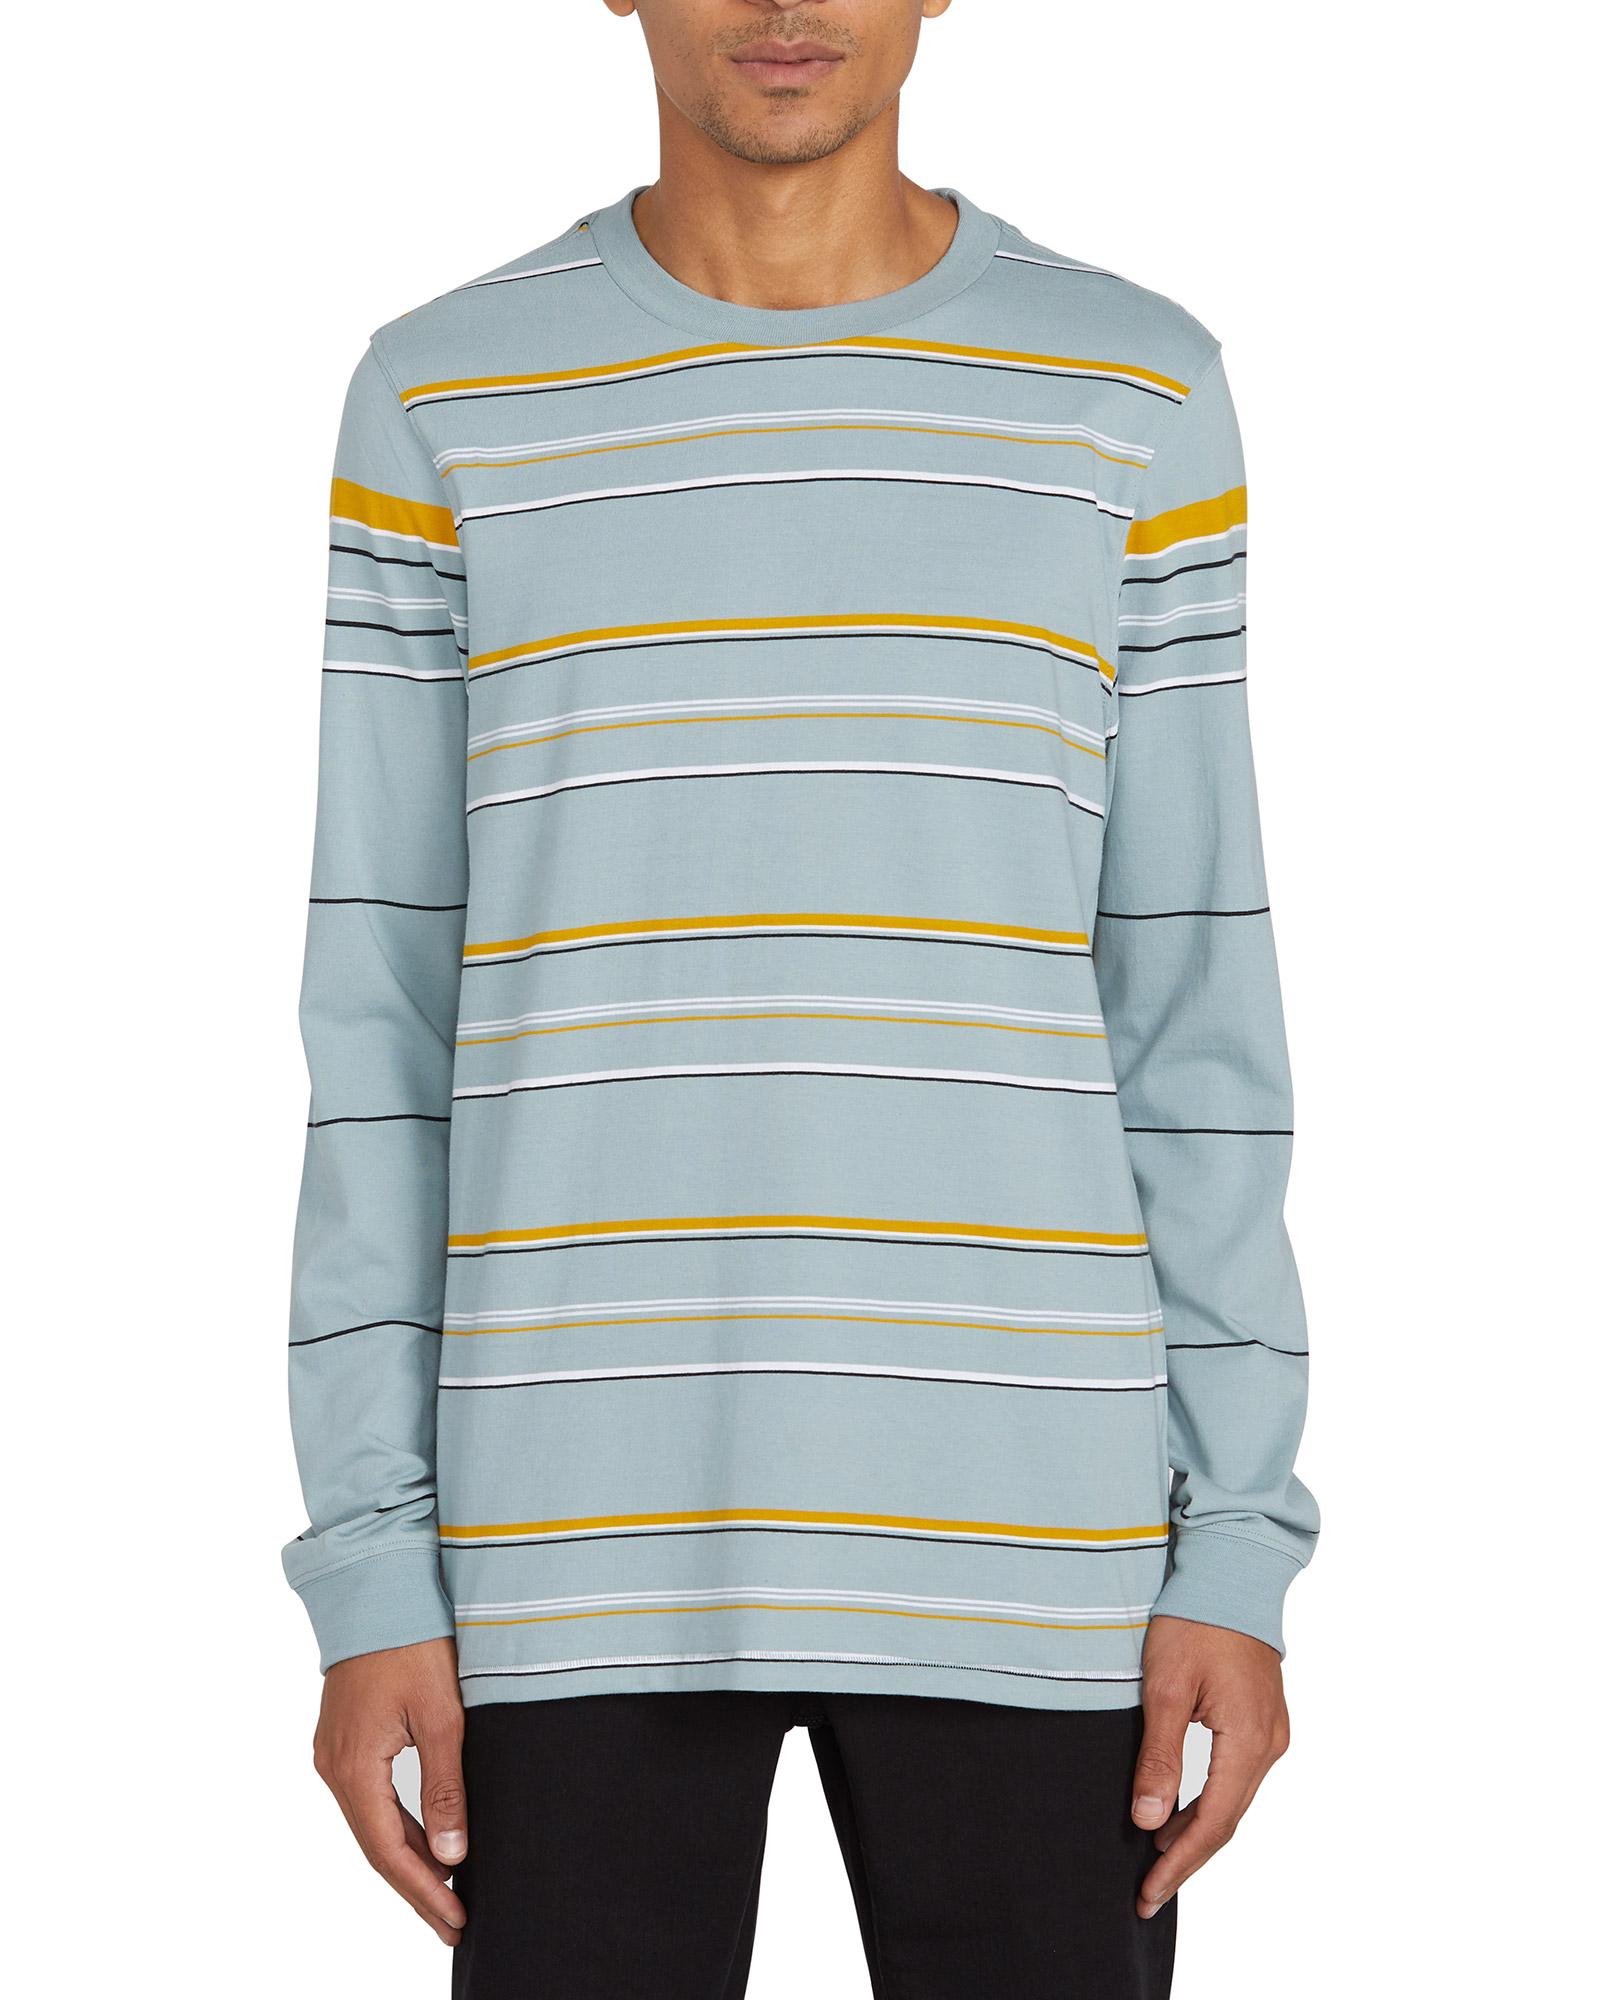 Volcom Men's CJ Collins Crew Long Sleeve T-Shirt 0